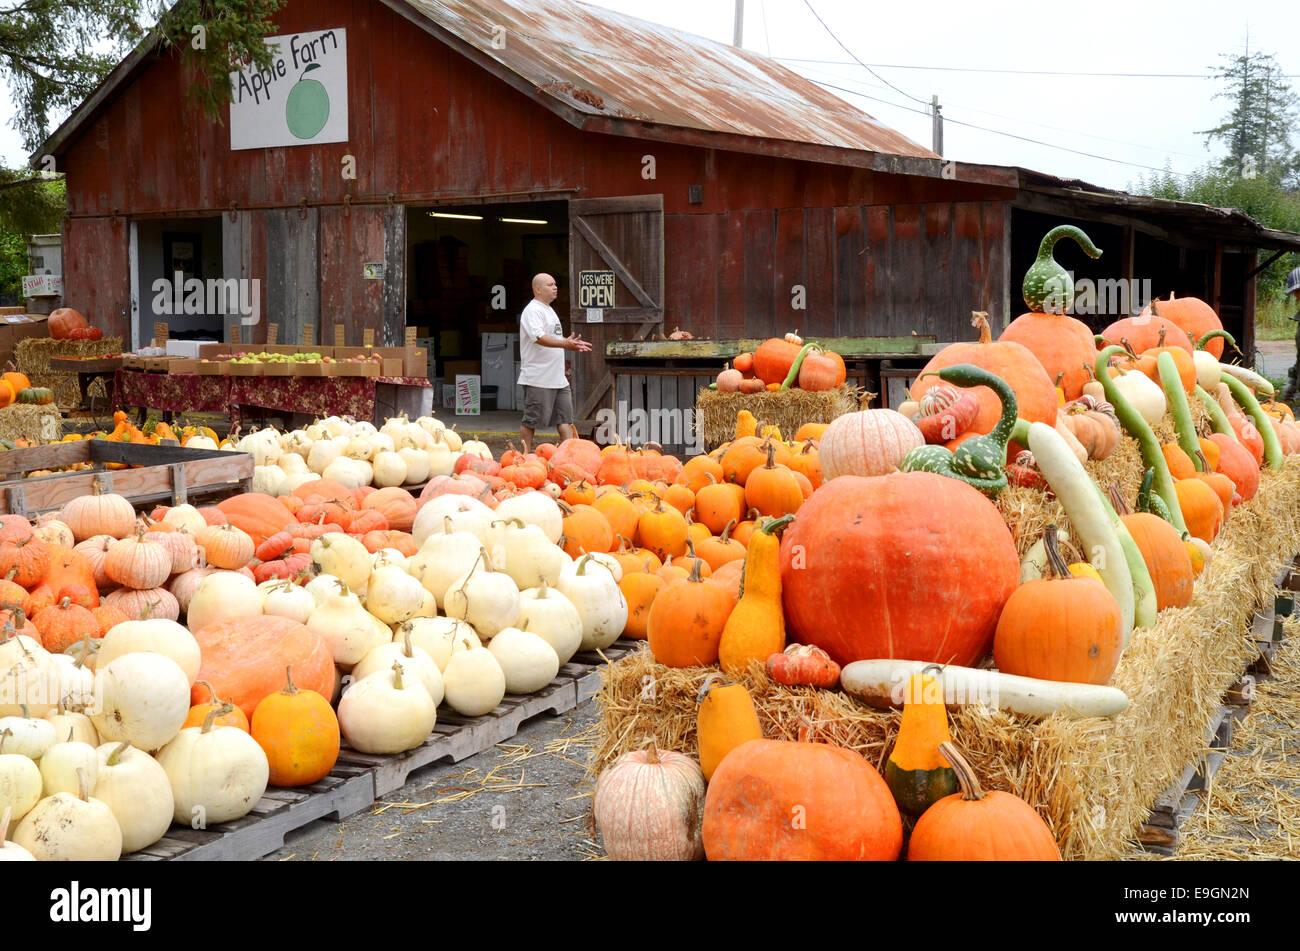 Display of pumpkins at a farnm near Sebastopol, California - Stock Image